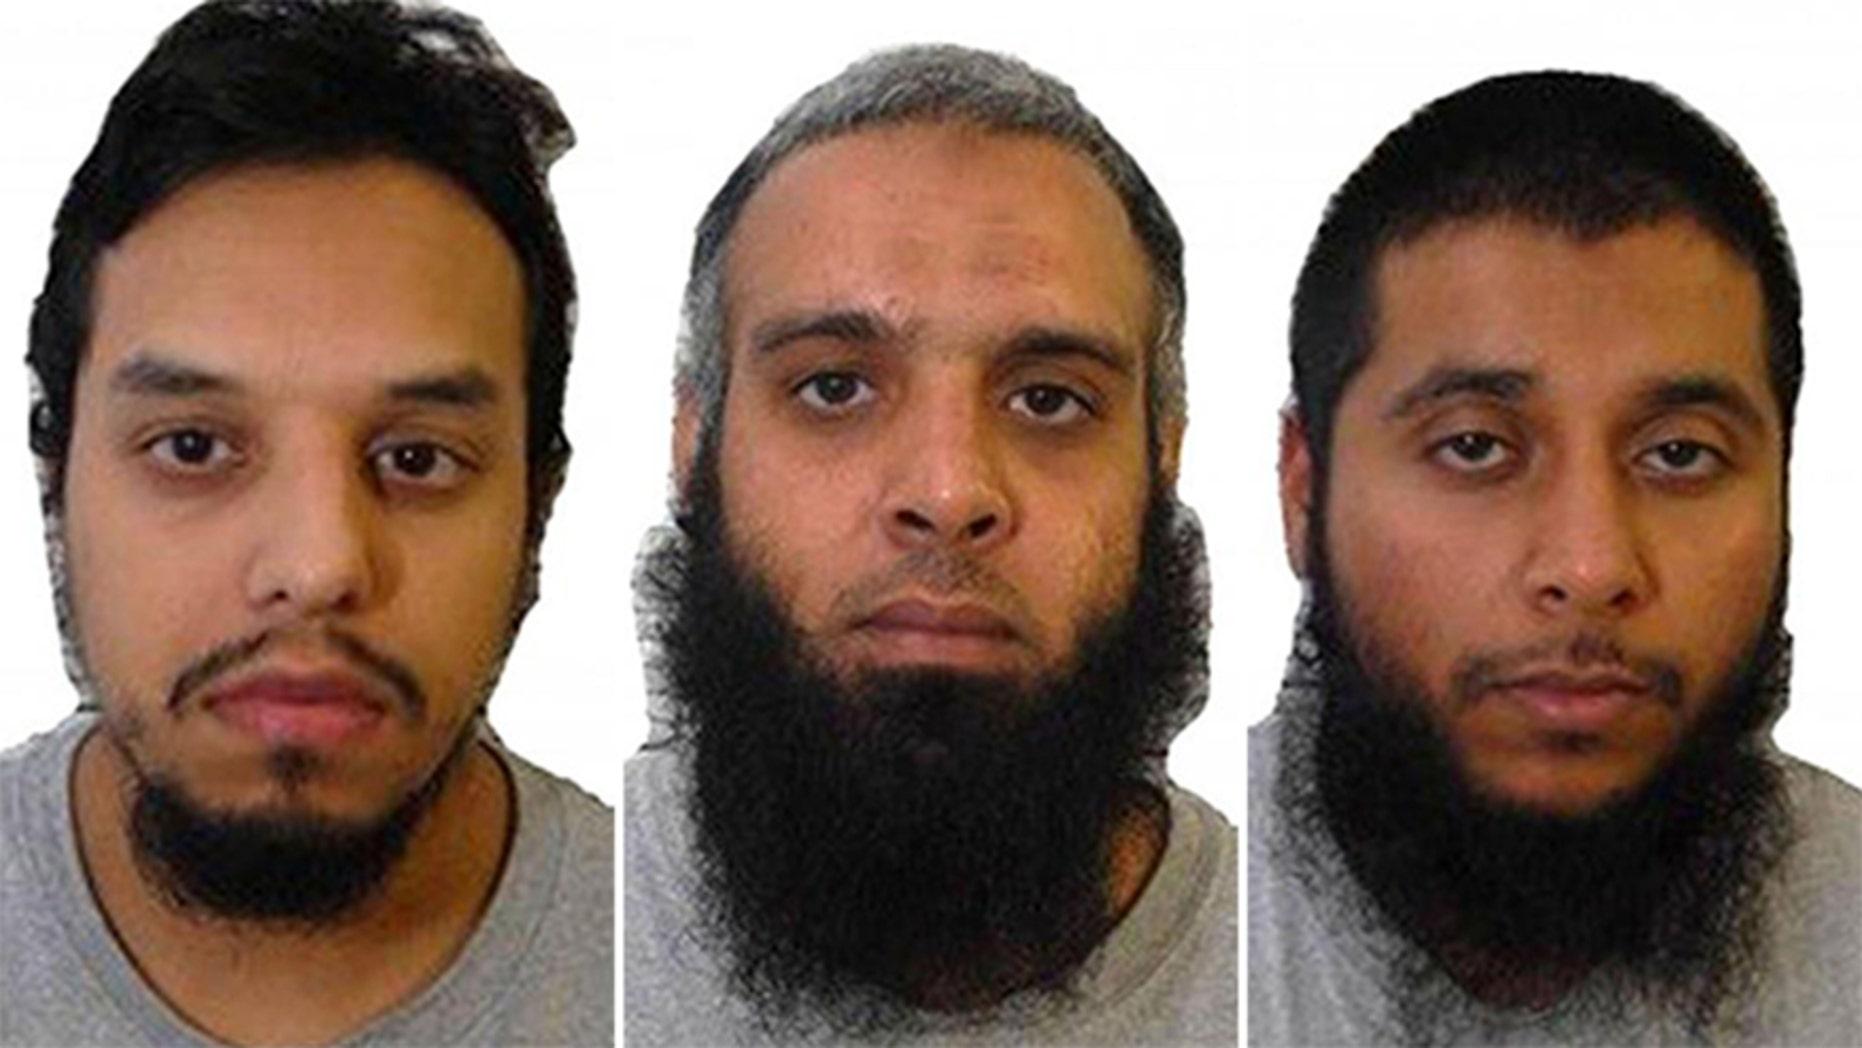 Mohibur Rahman, left, Naweed Ali and Khobaib Hussain were convicted of plotting a terror attack.